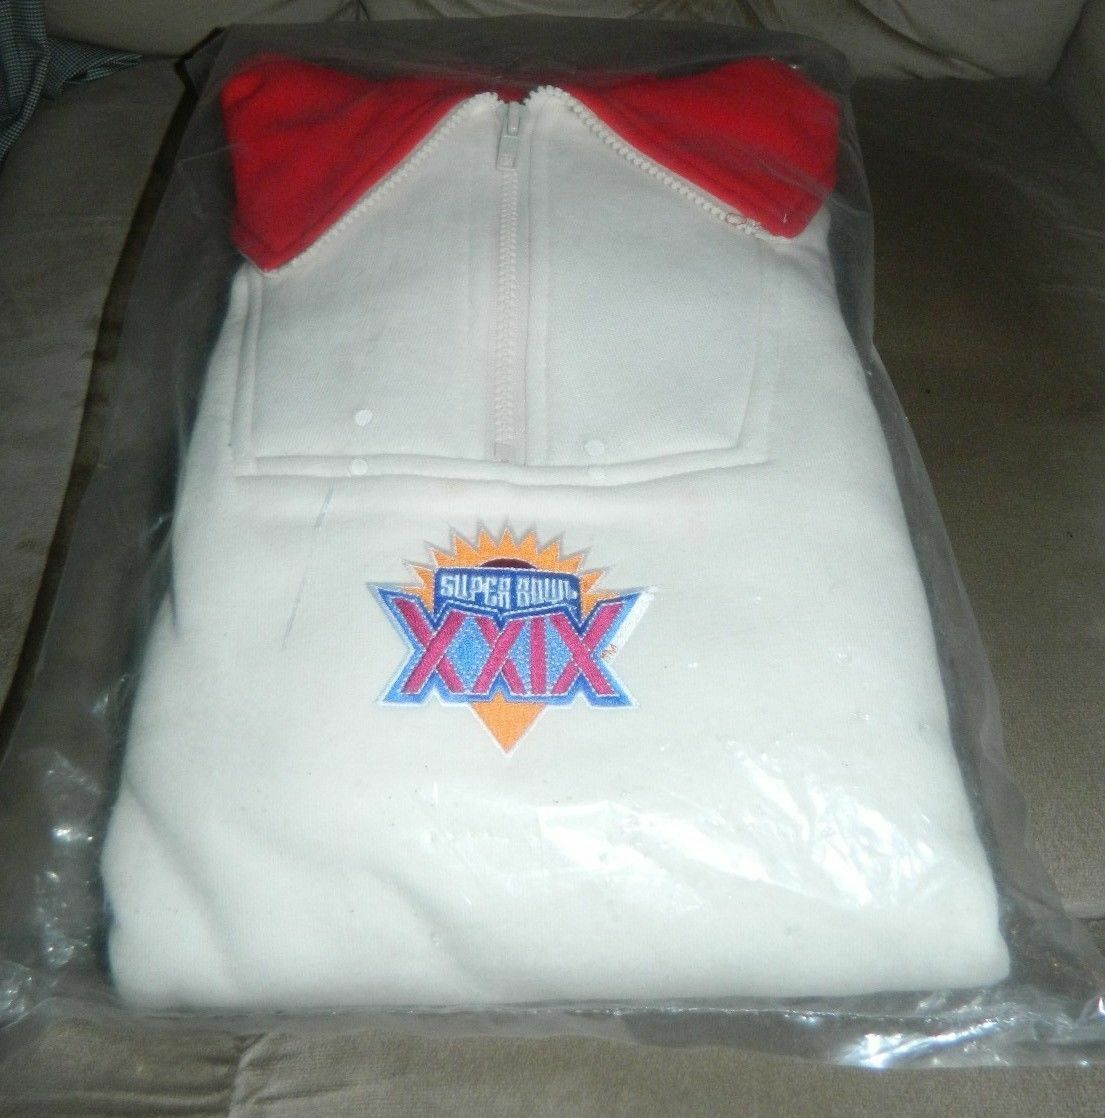 Neu J.J.Macintyre Super Bowl Xxix 29 Pullover Sweatshirt 49ers Ladegeräte